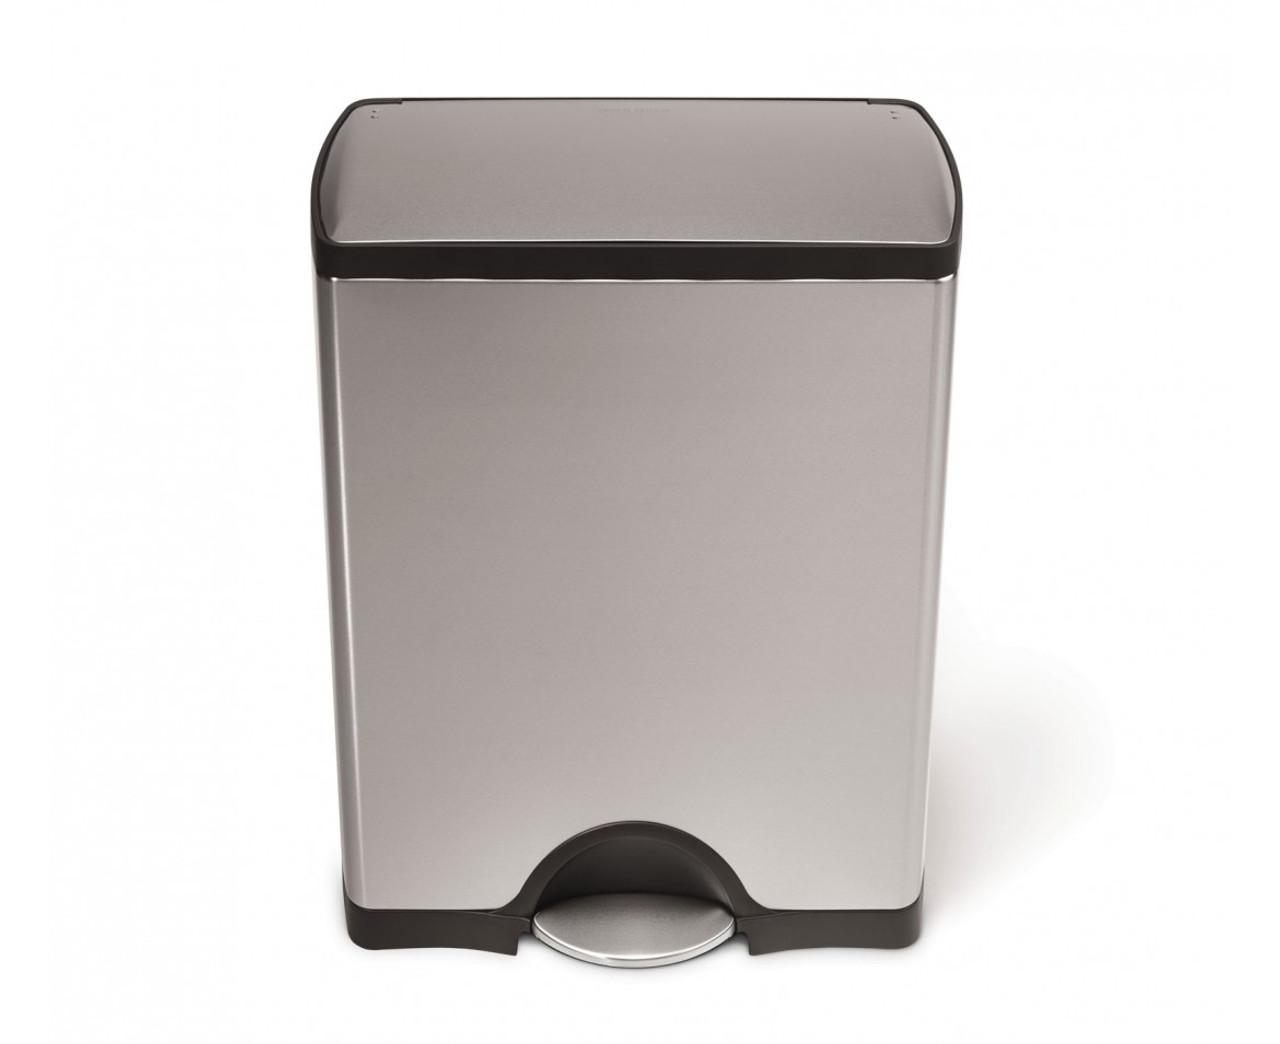 Simplehuman 50 Litre Stainless Steel Rectangular Kitchen Bin